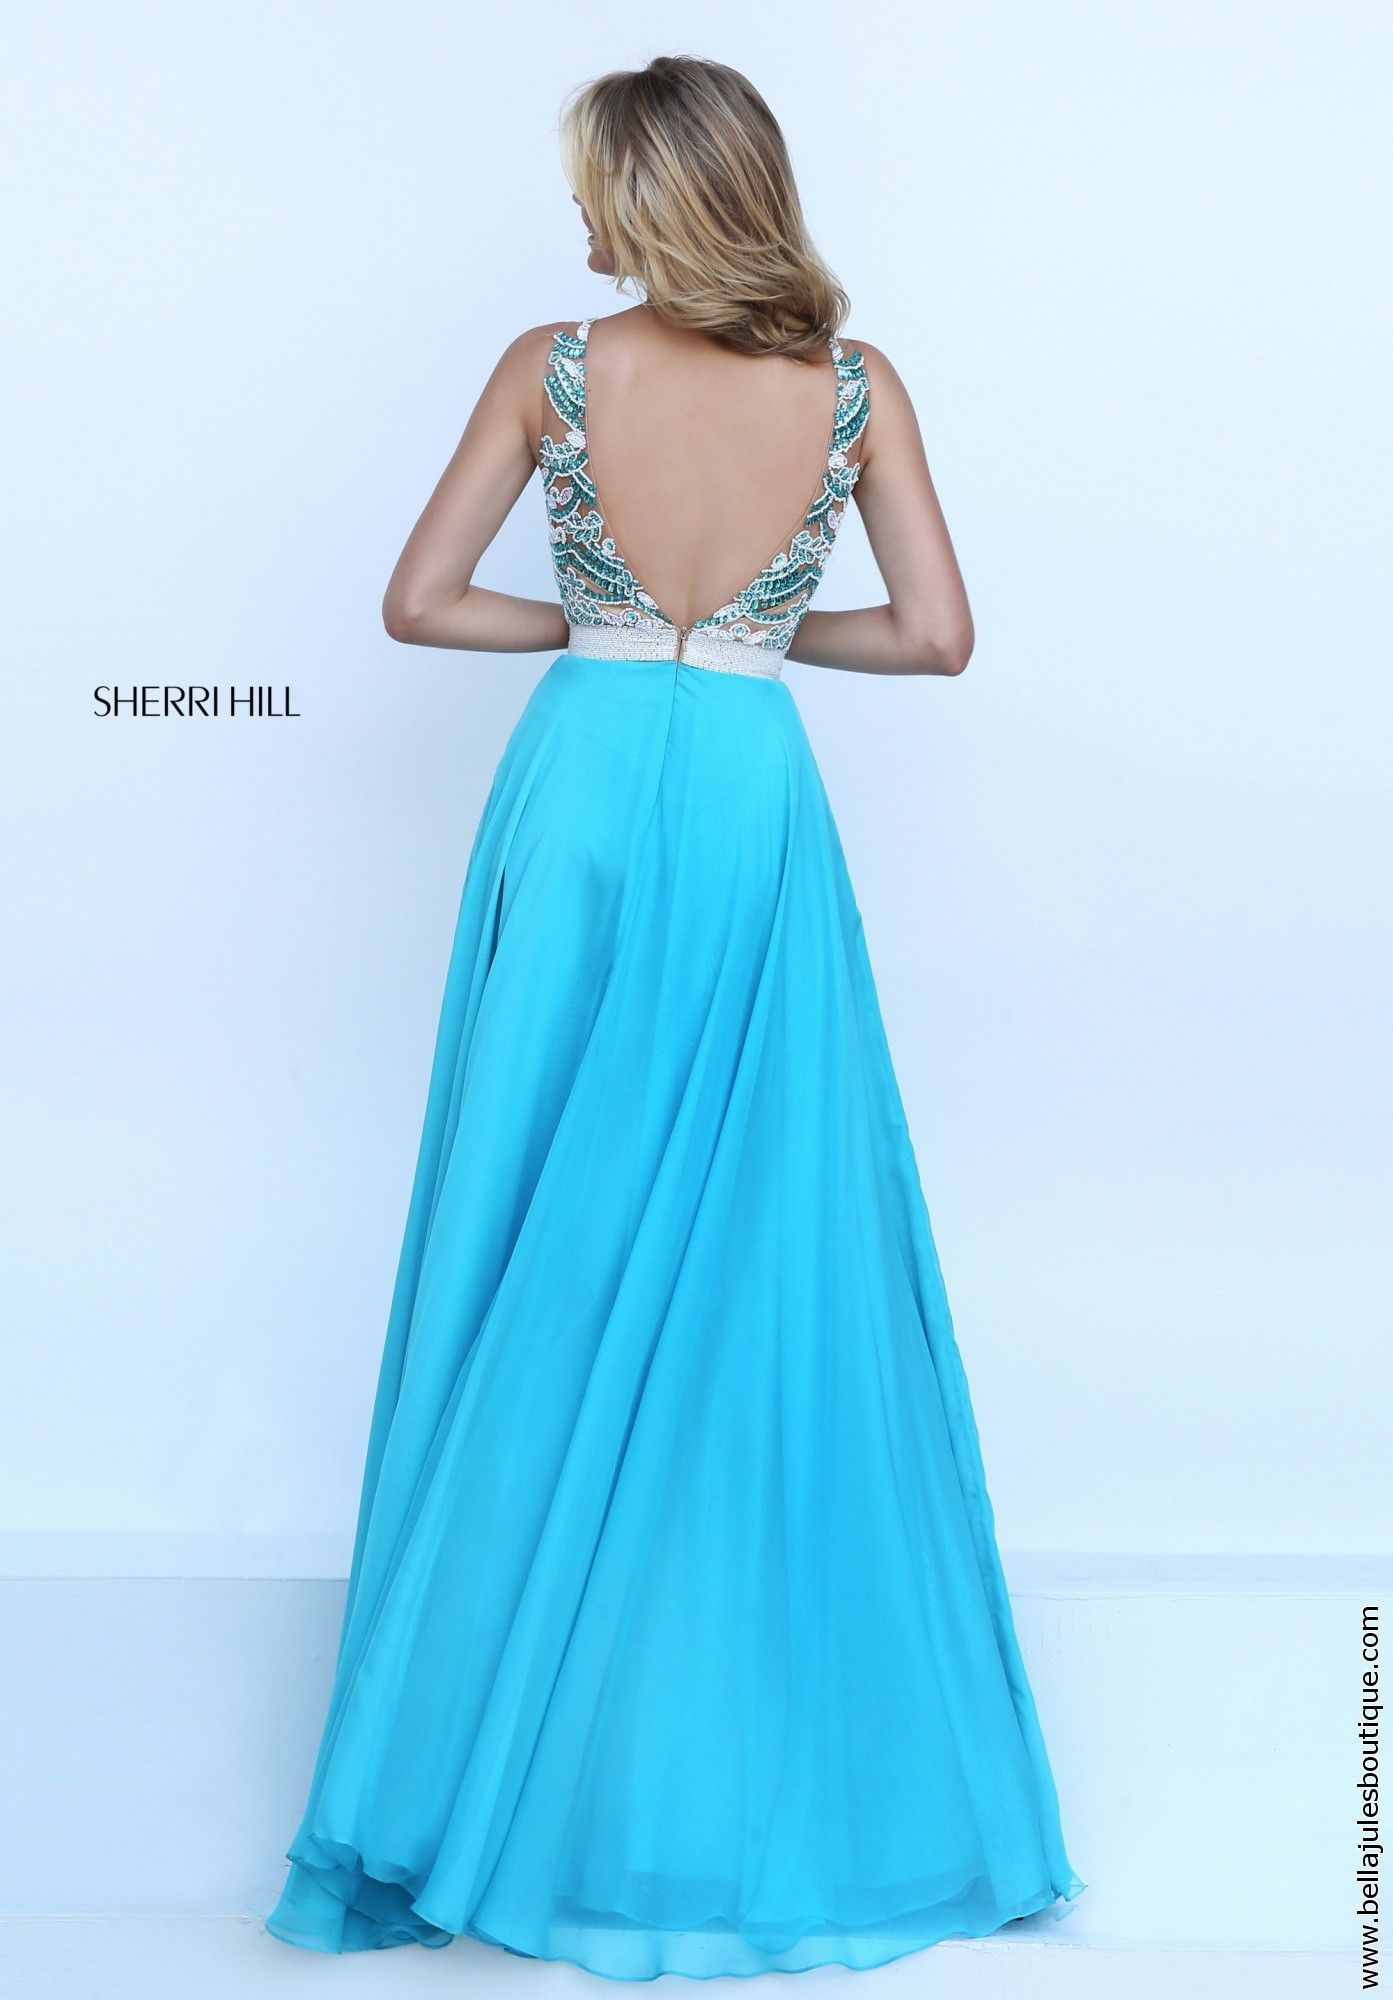 Sherri hill prom dress style vestidos pinterest sherri